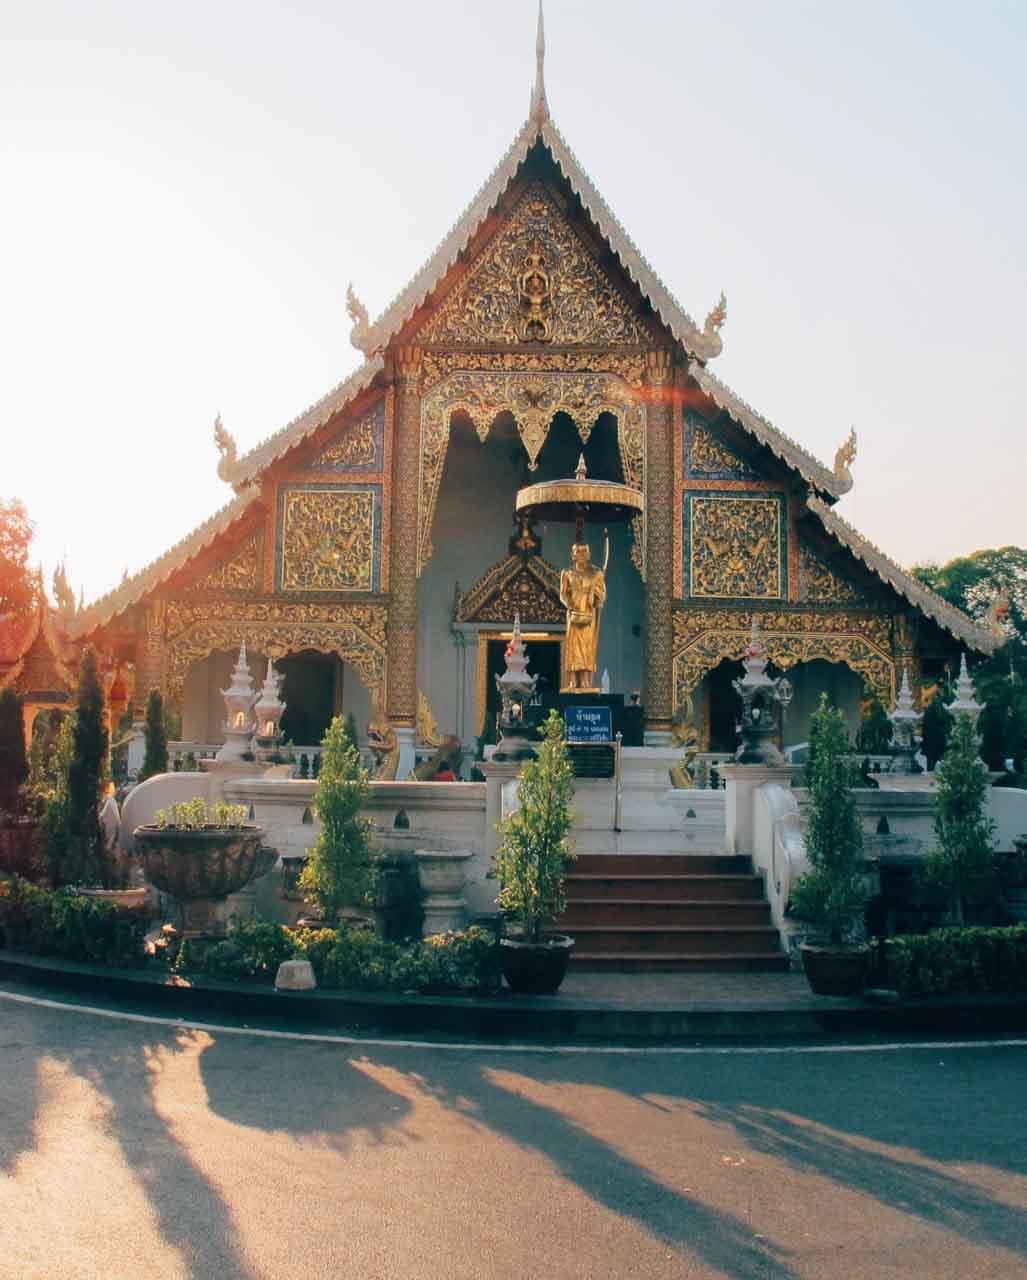 Passeios em Chiang Mai, Tailândia - templo budista na Tailândia